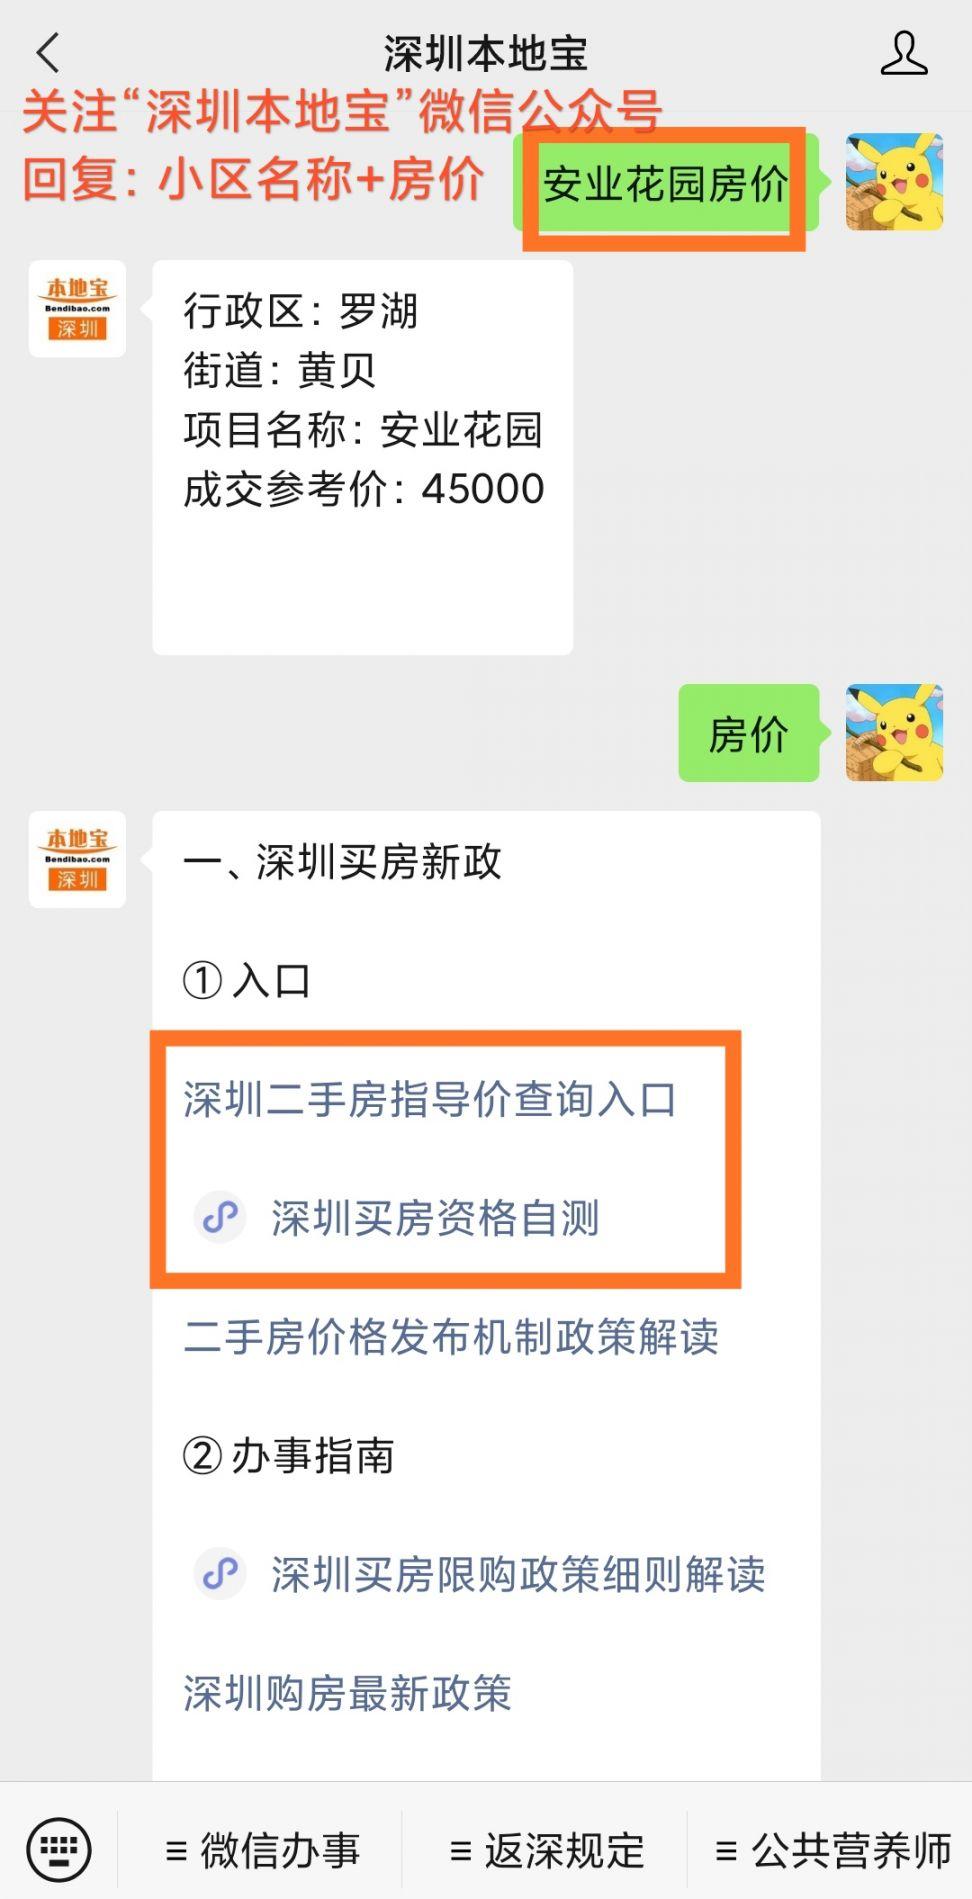 http://www.edaojz.cn/youxijingji/881498.html